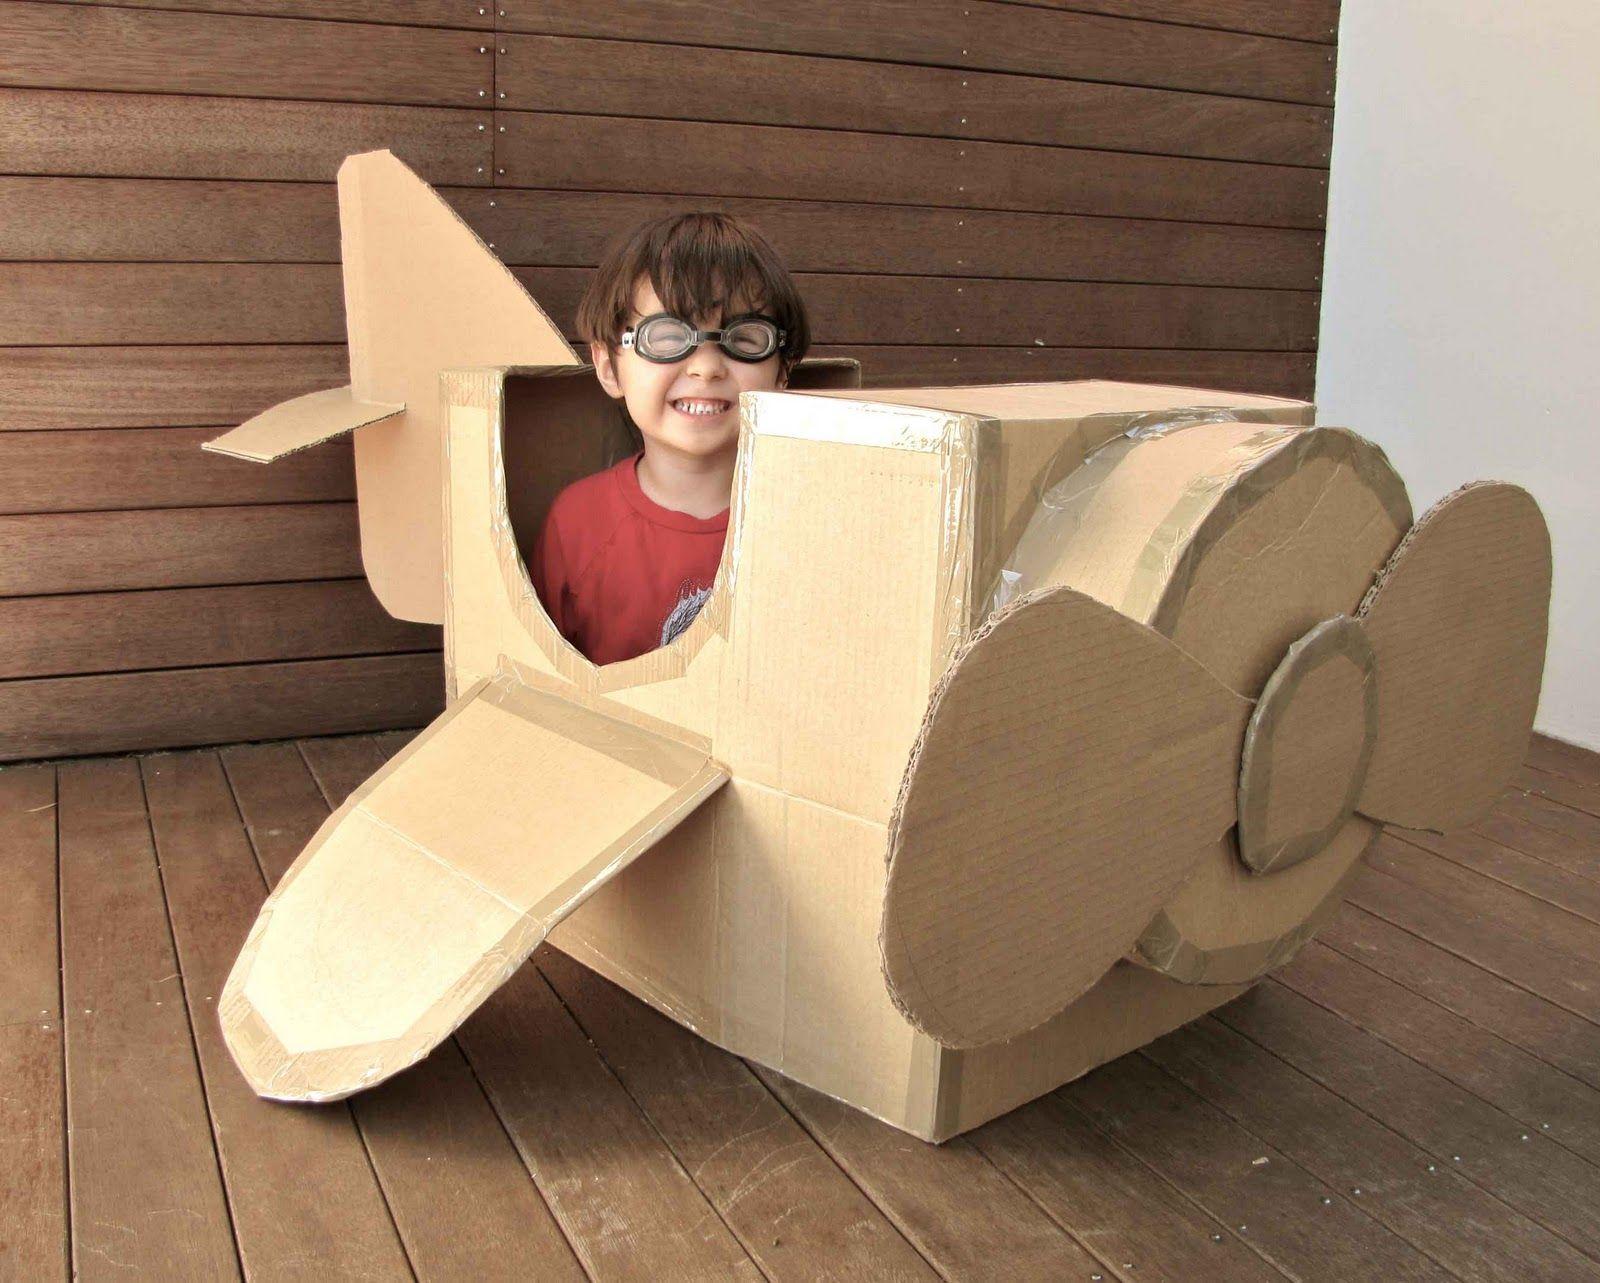 Diy cardboard box plane ny minimocha diy toyplane carboardbox